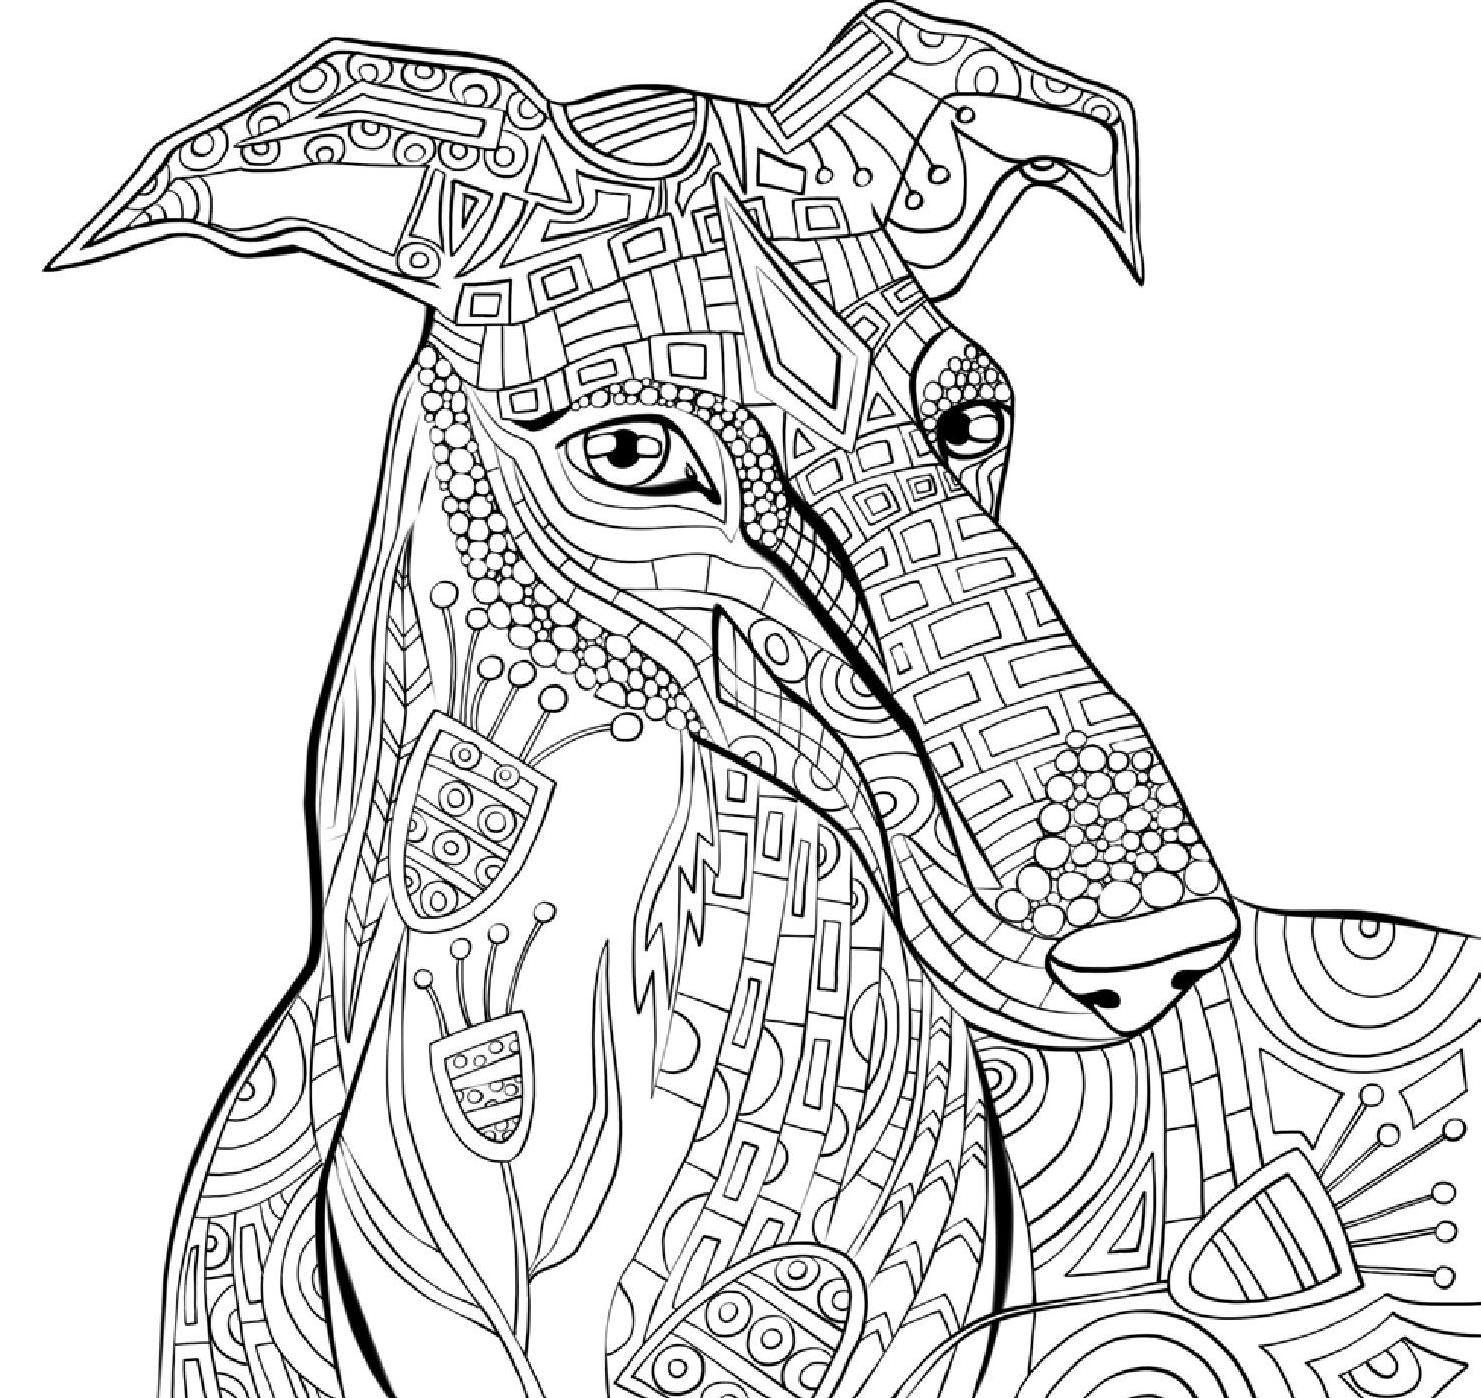 Um reino de cores | Imagenes de perros, Mandalas y Corte de pelo